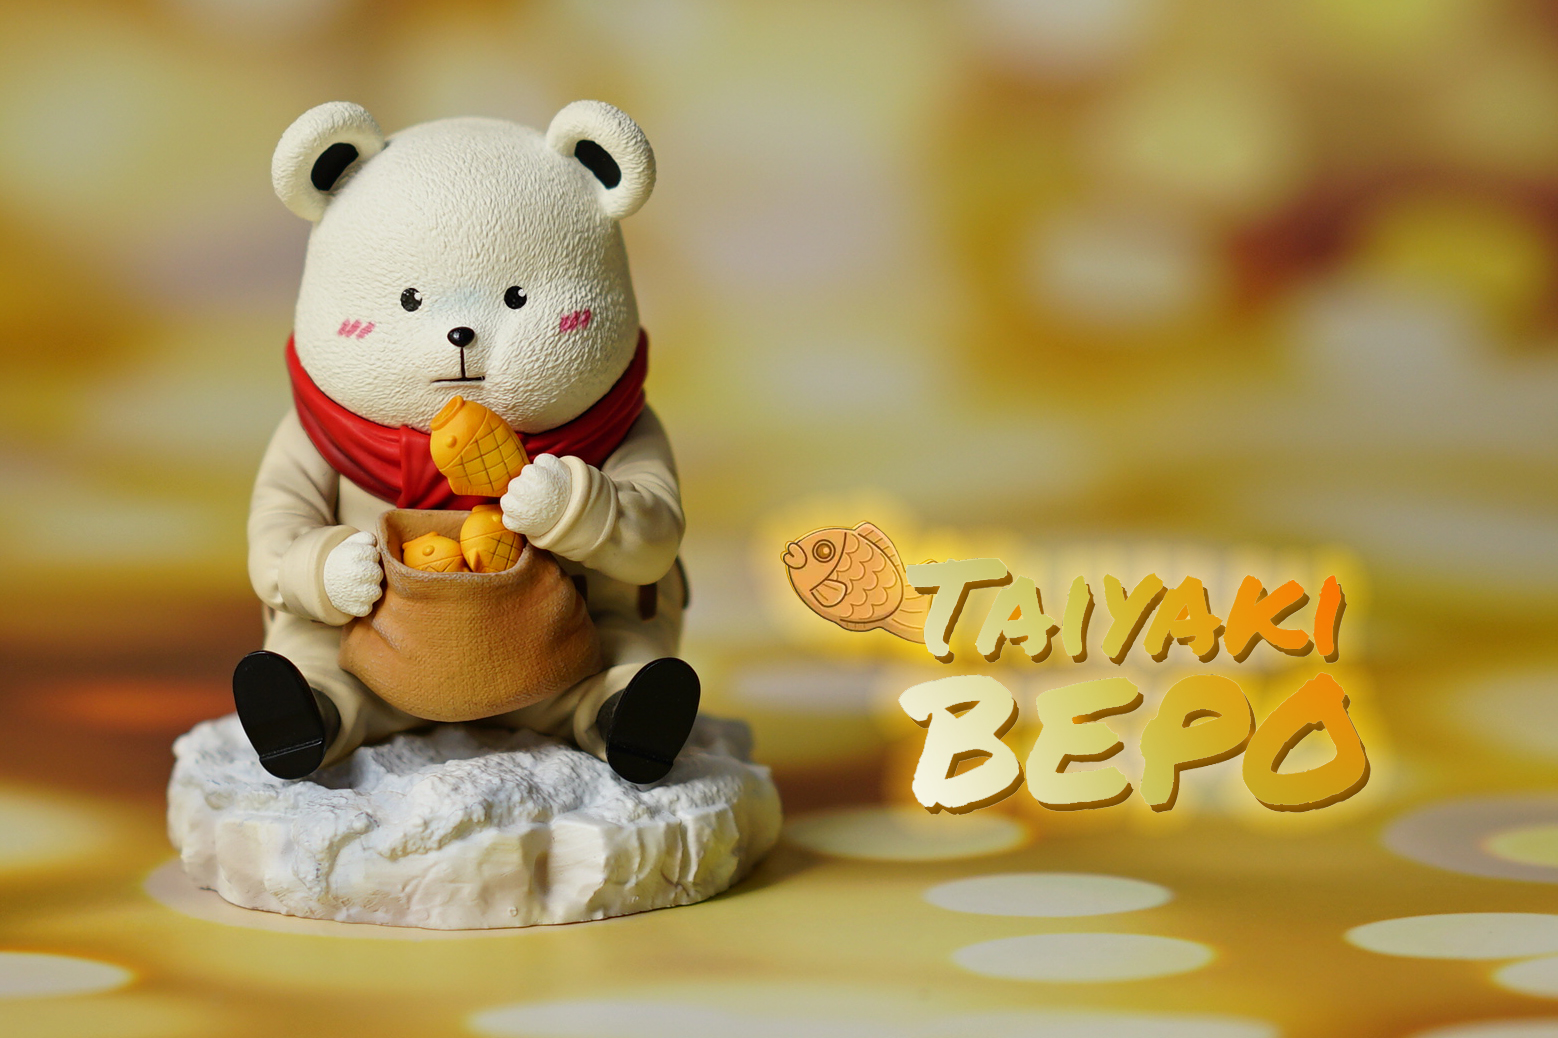 White BEPO น้องหมี x ขนมไทยากิ  A+ Studio (มัดจำ)